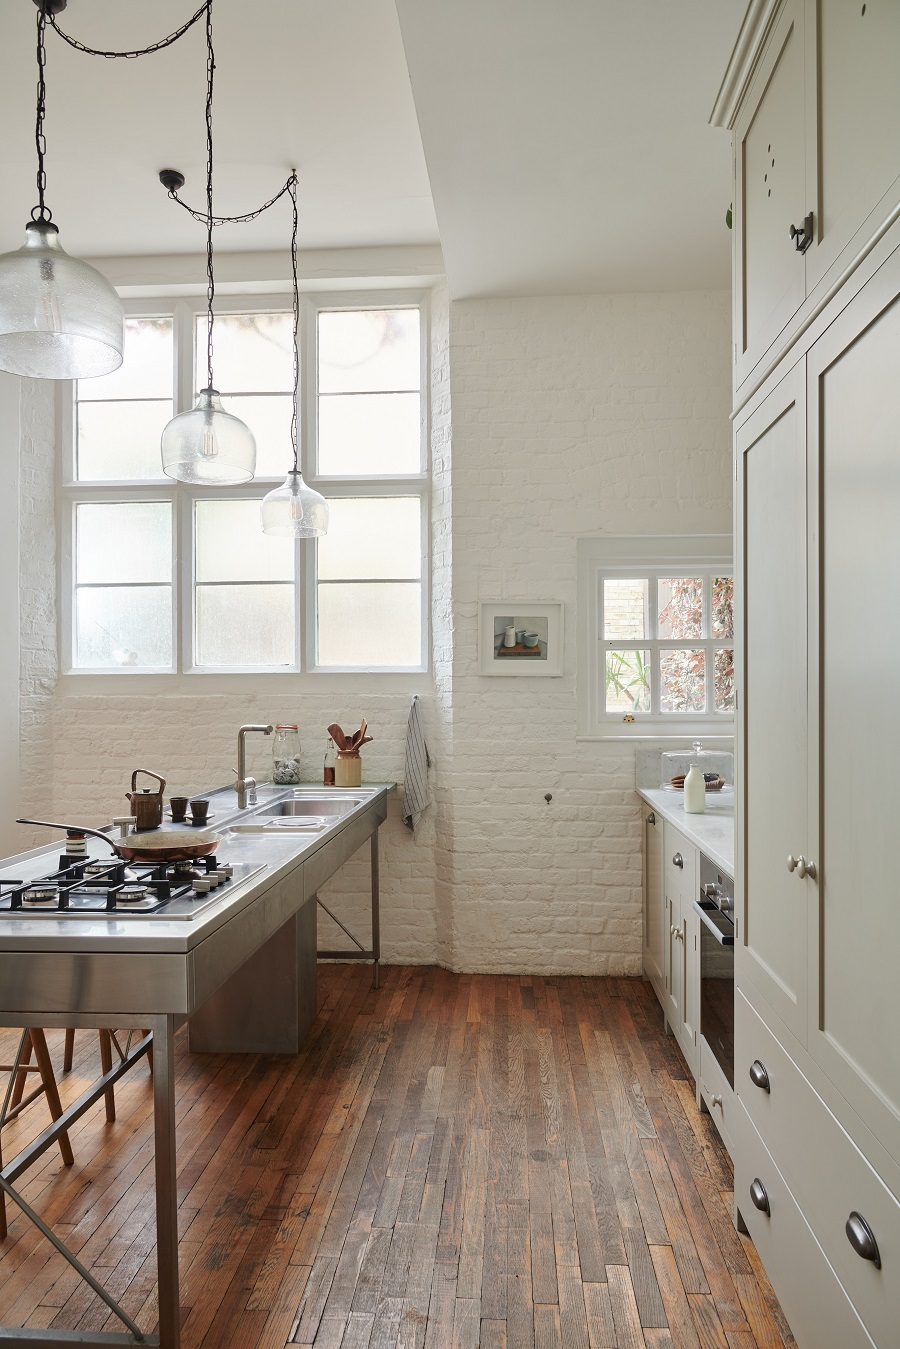 An Old Schoolhouse Kitchen by deVOL